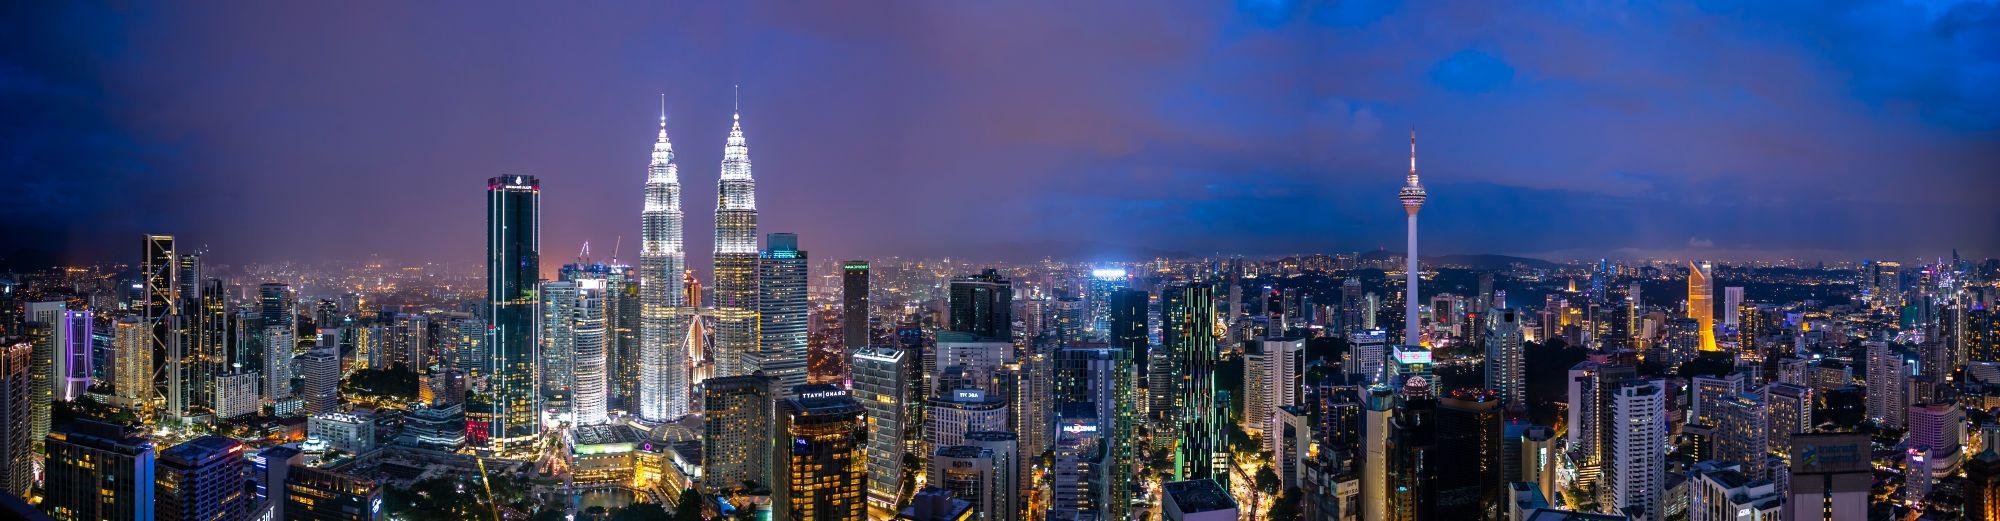 Maleisie Kuala Lumpur panorama